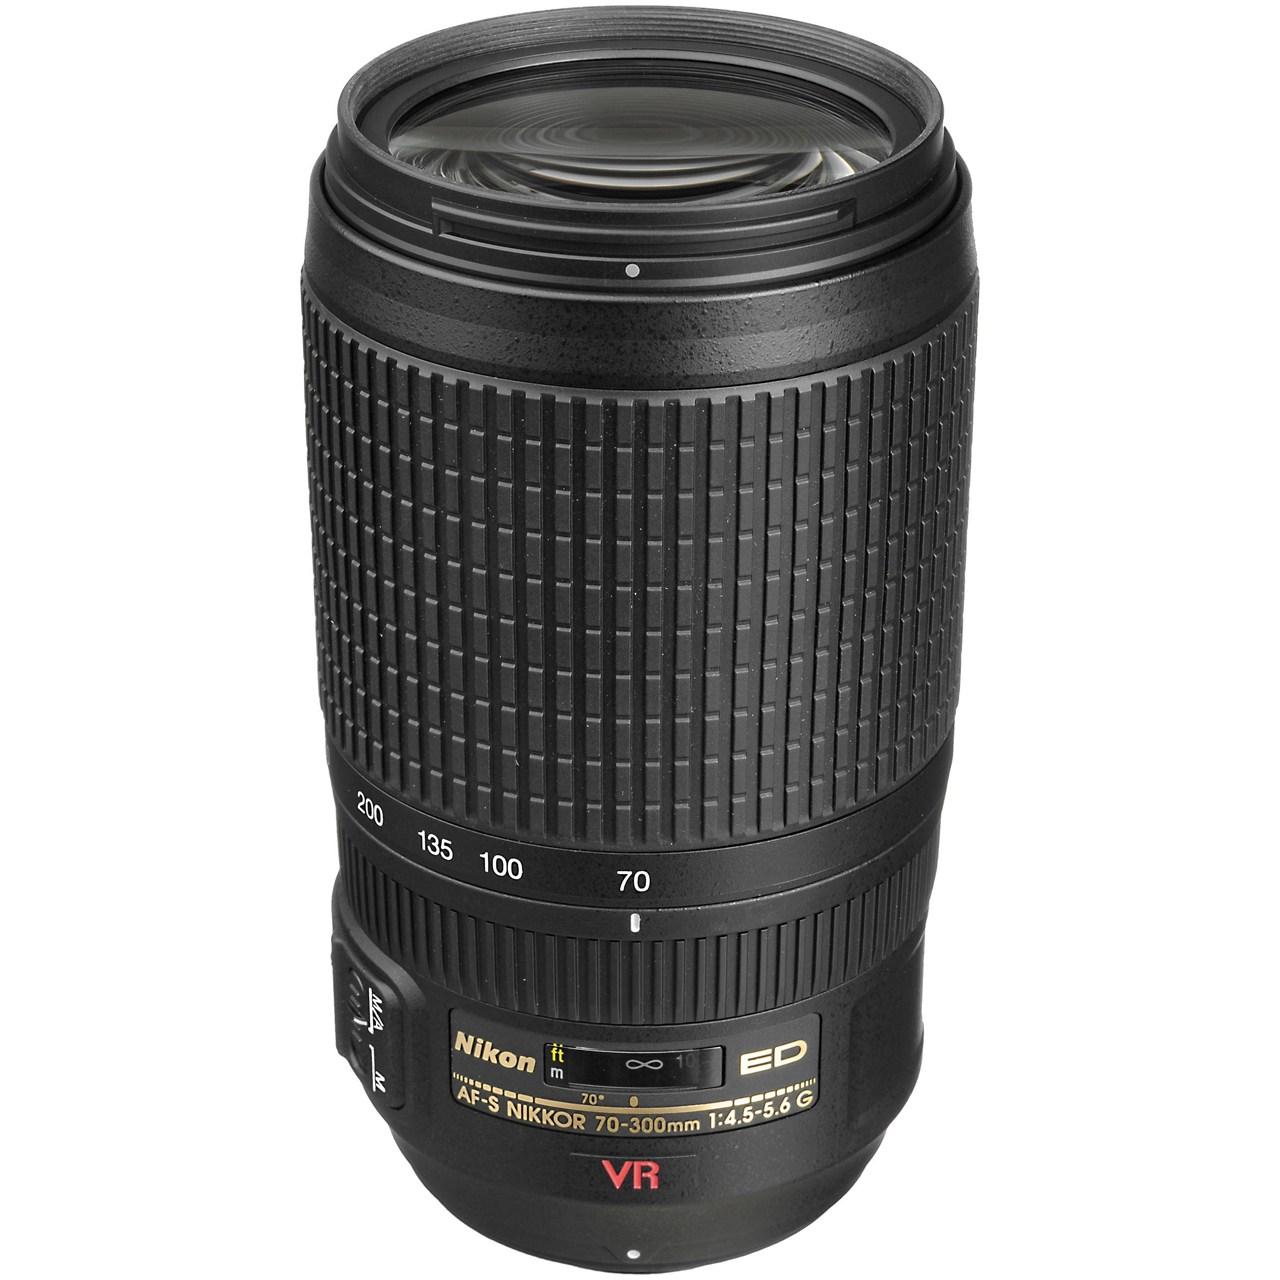 لنز نیکون مدل 70-300mm f/4.5-5.6 G IF ED